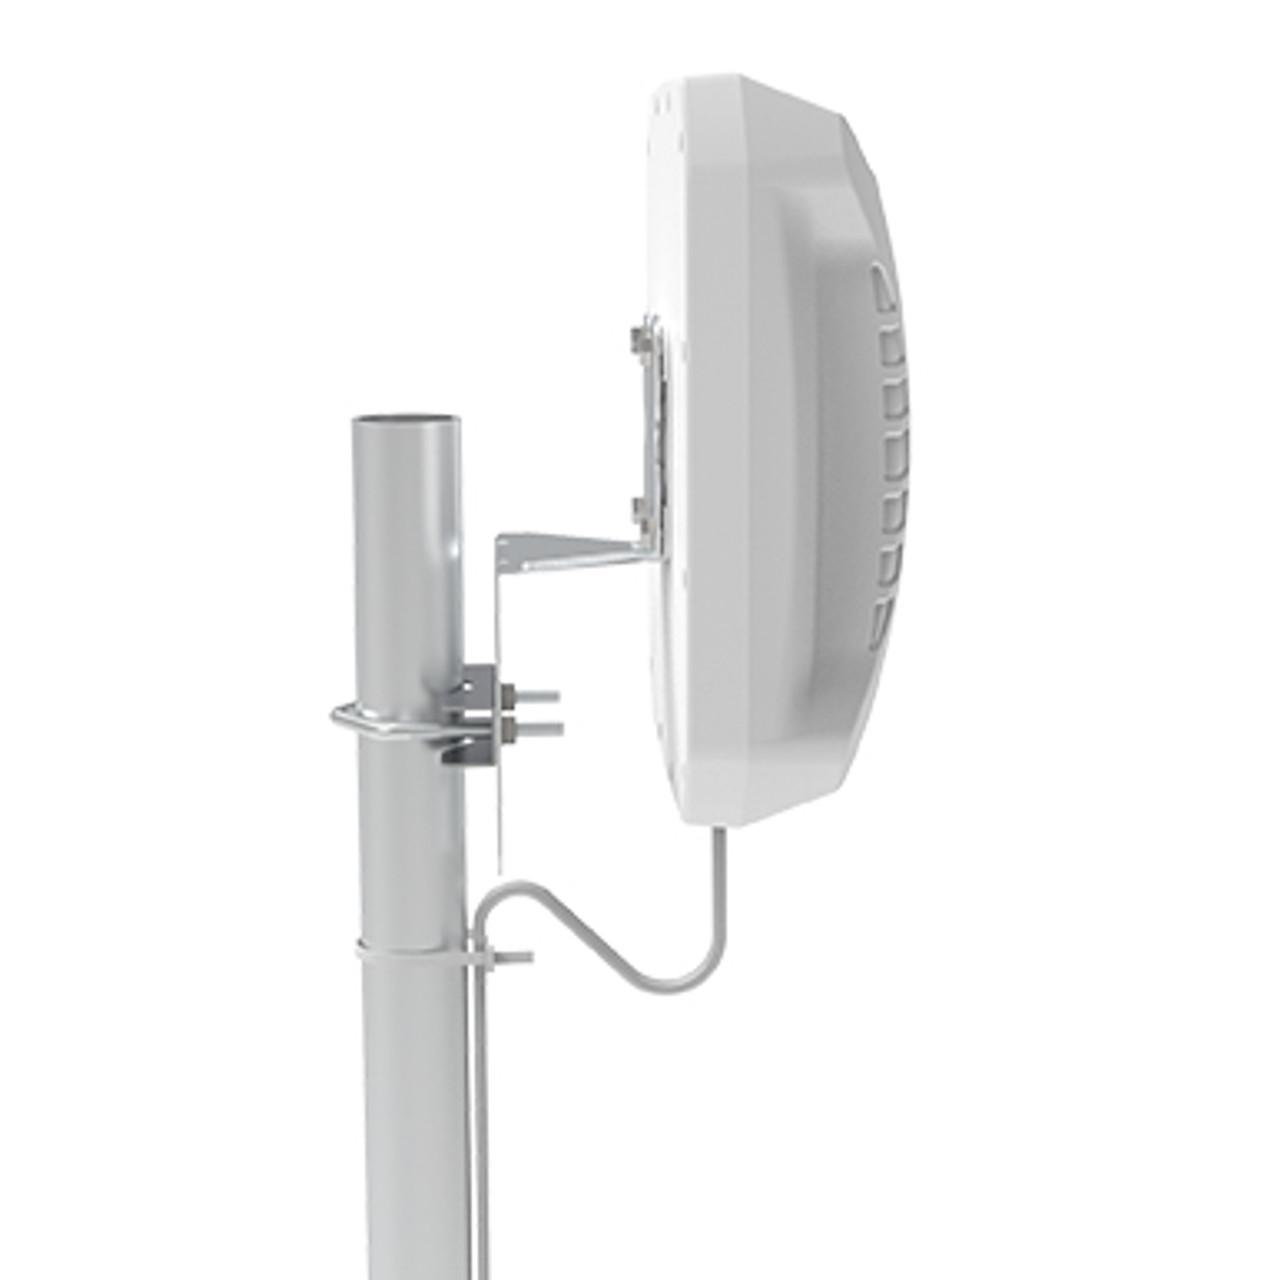 The Crossbow (SMA-Male) - MIMO Cross Polarized 5G Antenna